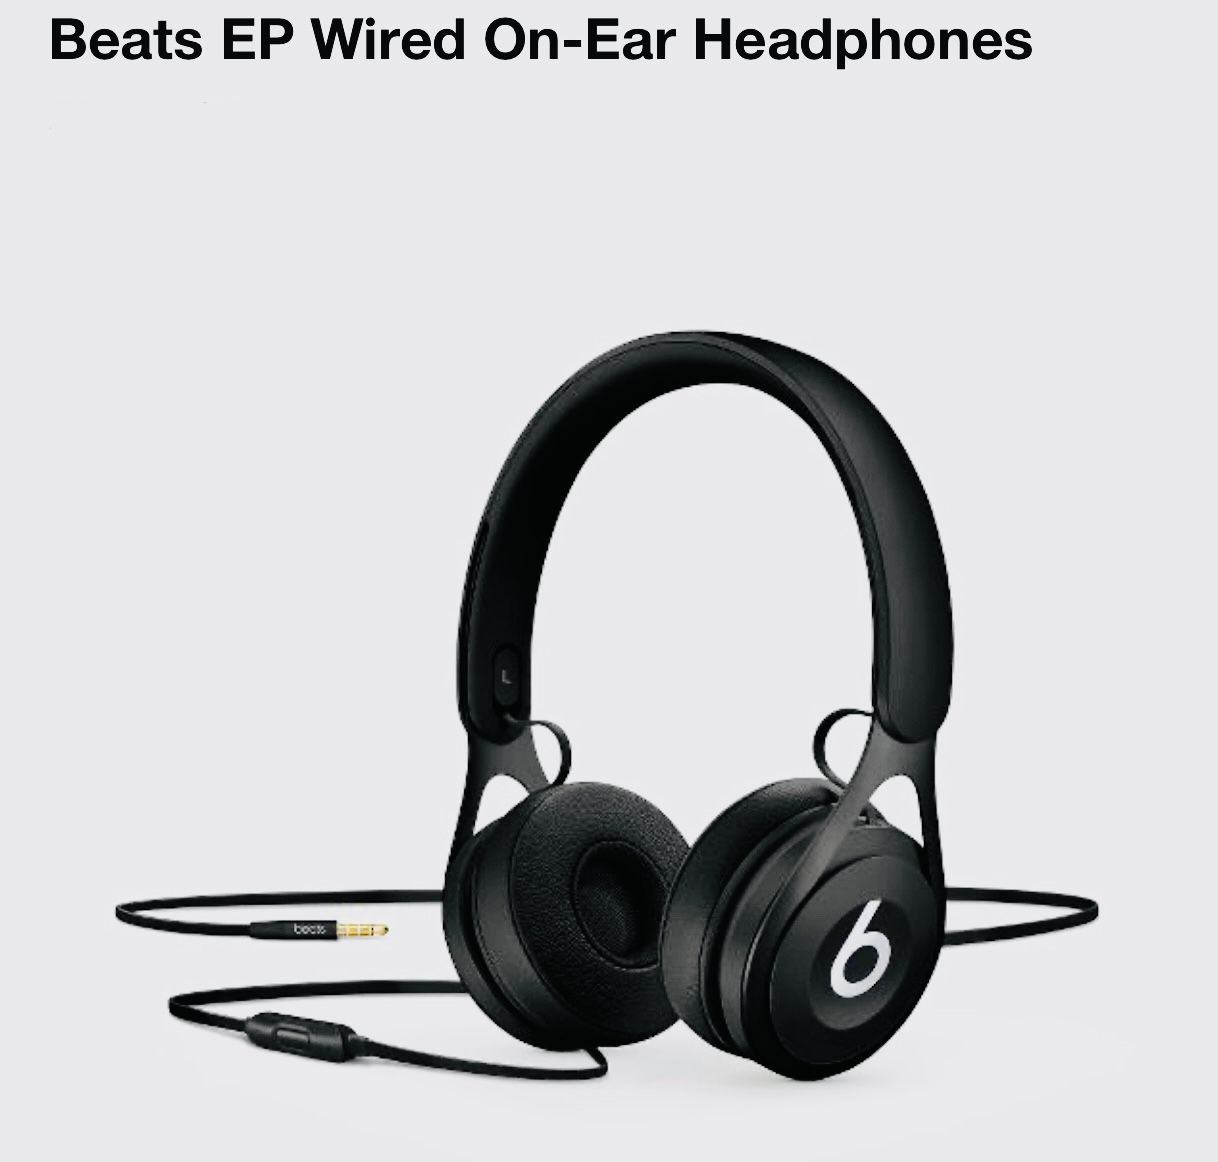 BRAND NEW Beats By Dre EP Headphones